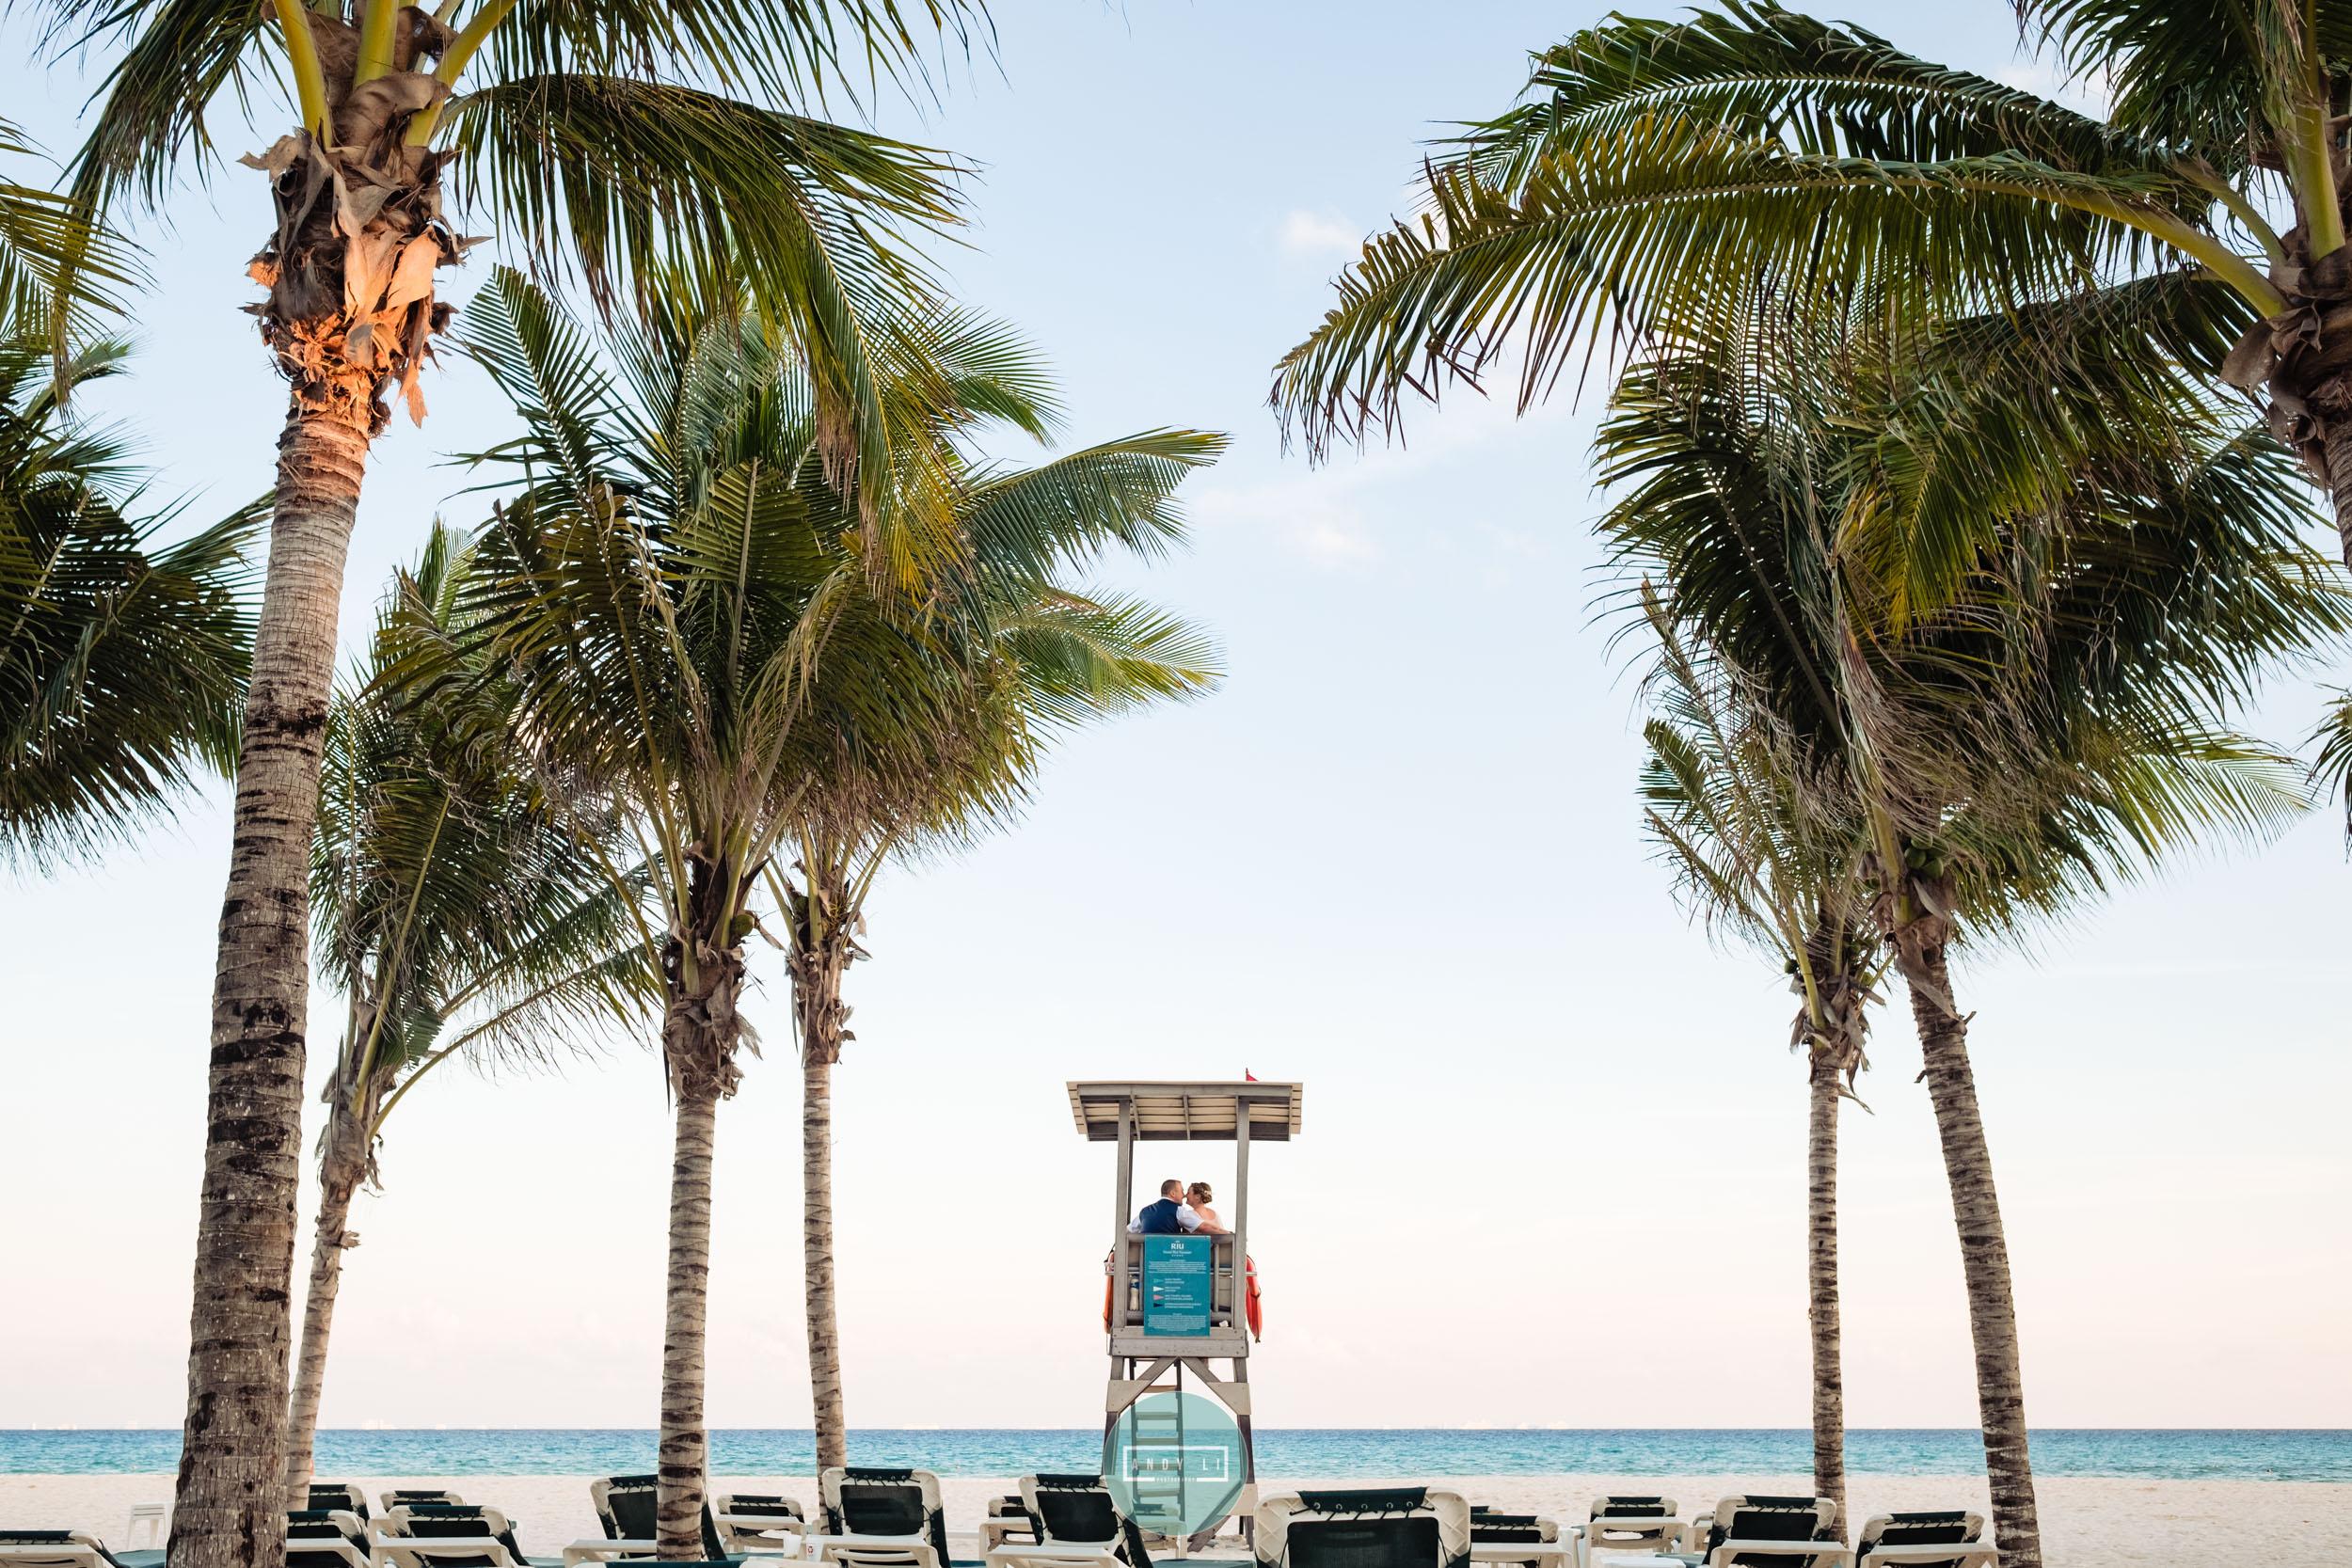 Playa del Carmen Mexico Wedding Photography-039-AXT22857.jpg